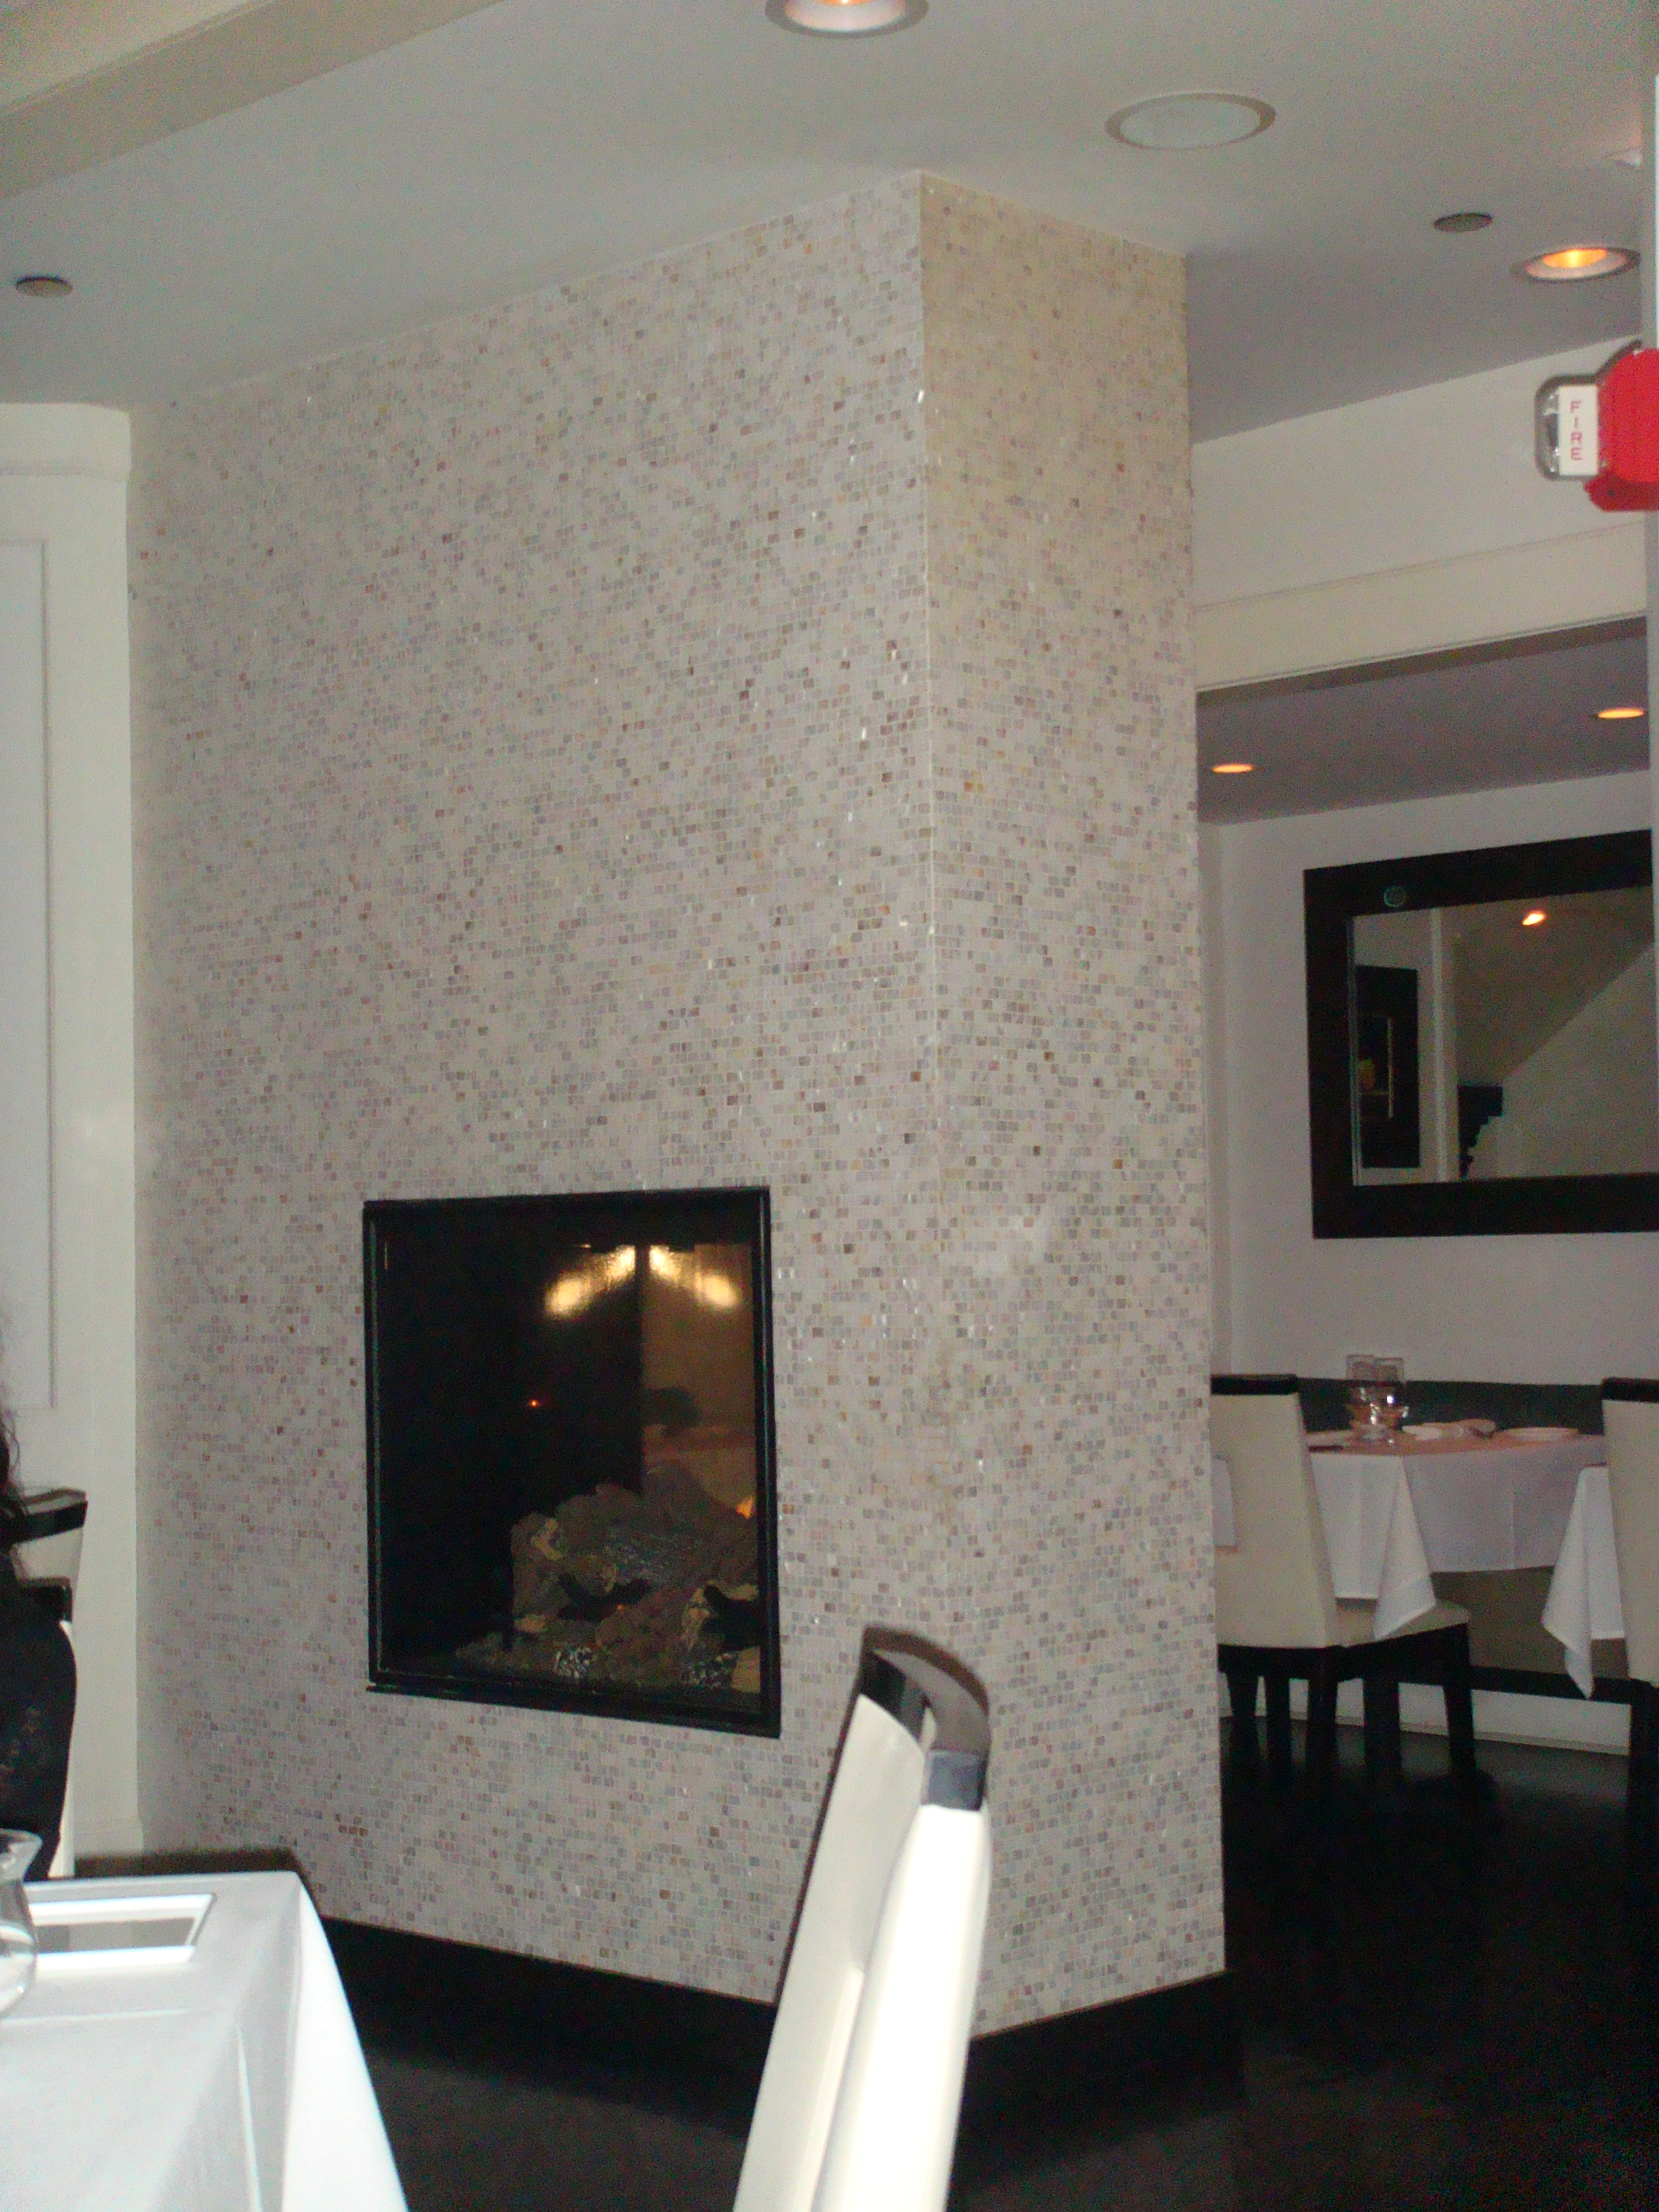 foodies flock to pelago ristorante on delaware place in chicago